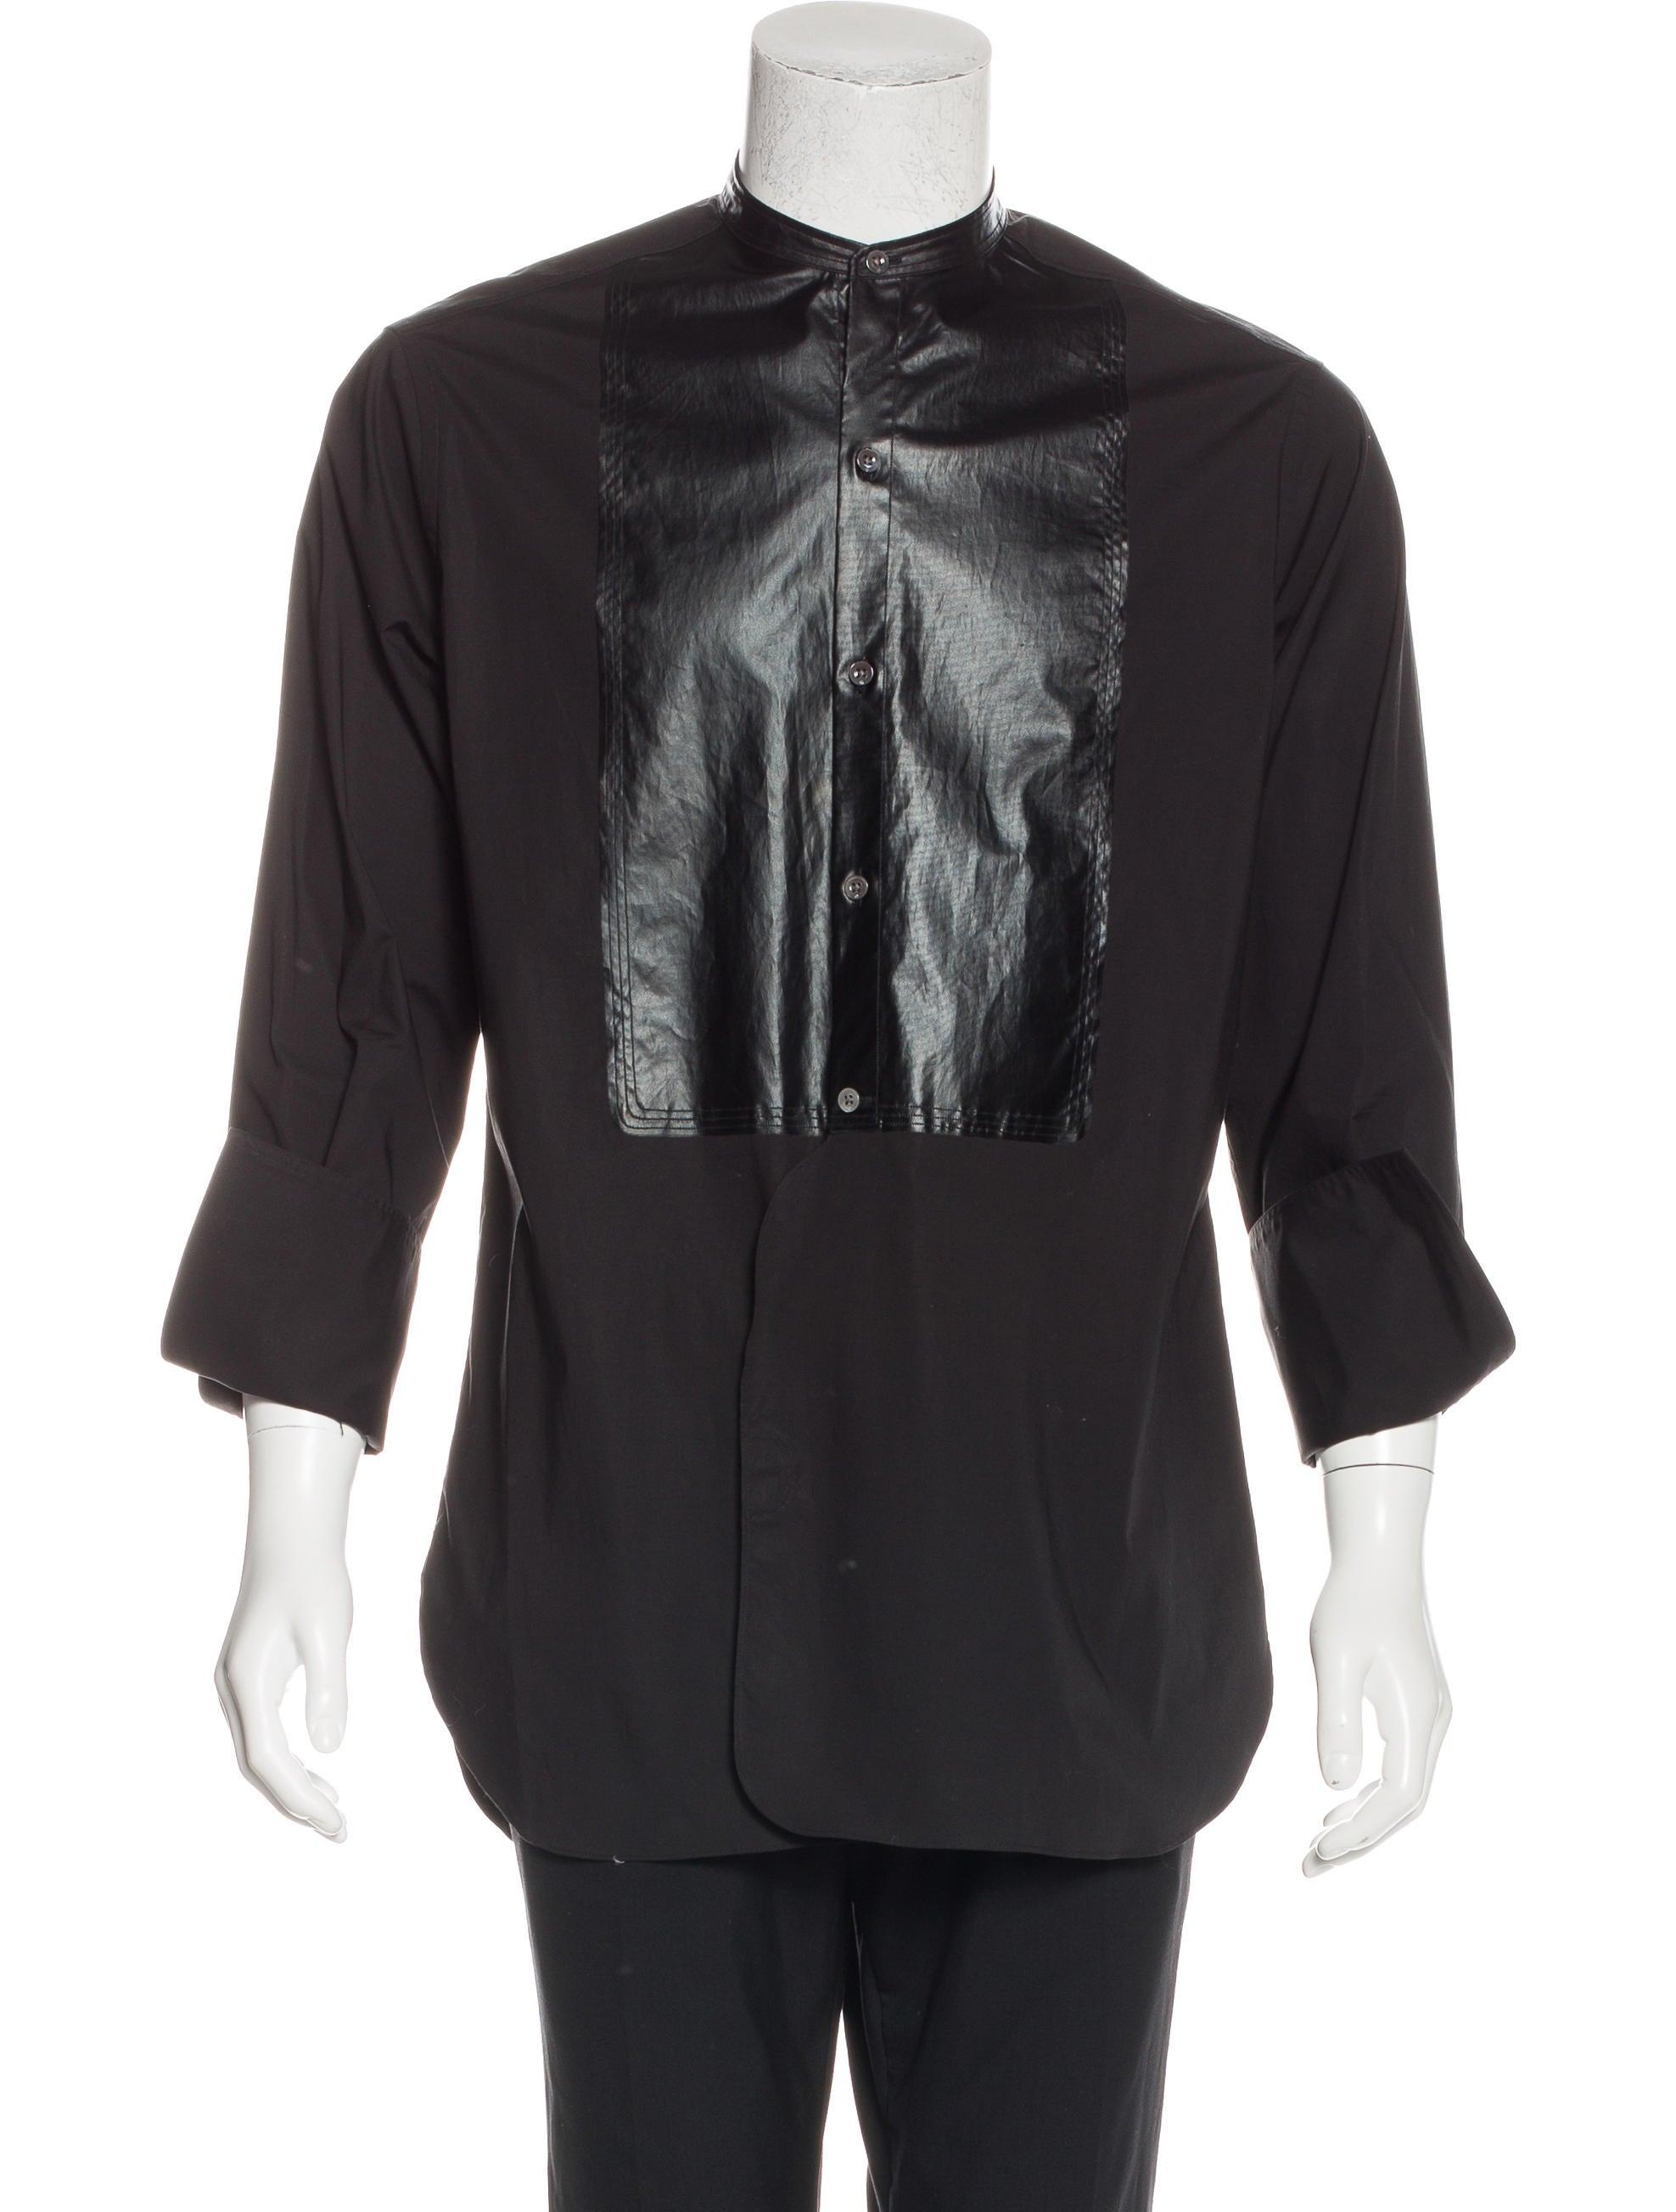 3 1 phillip lim tuxedo french cuff shirt clothing for Tuxedo shirt french cuff